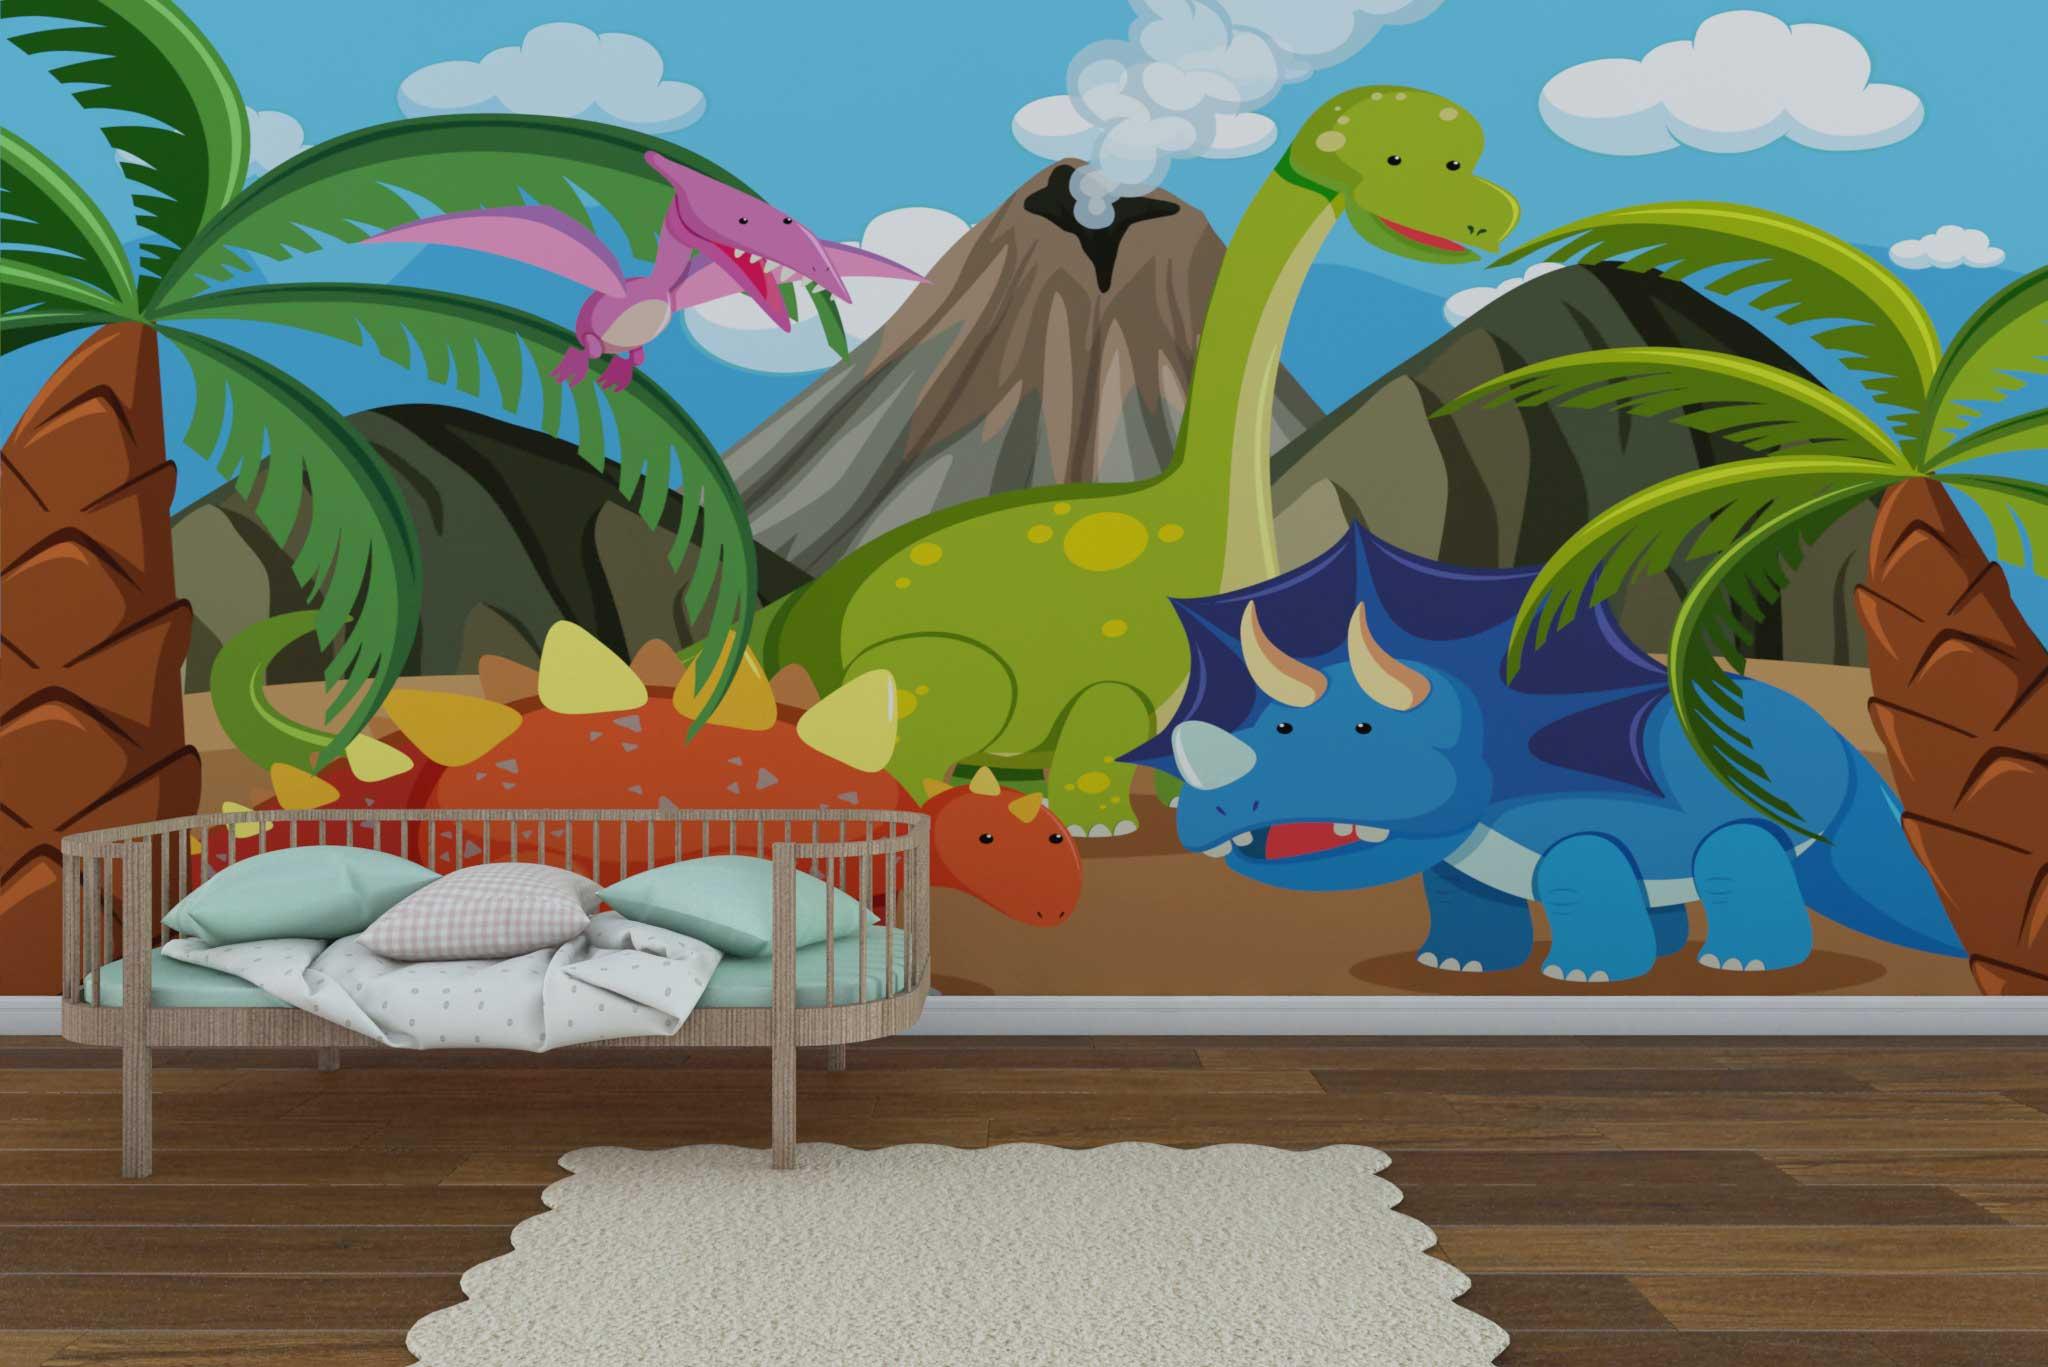 tapet-fototapet-comanda-personalizat-bucuresti-camera-dormitor-copii-model-desen-dinozauri-multicolor-2